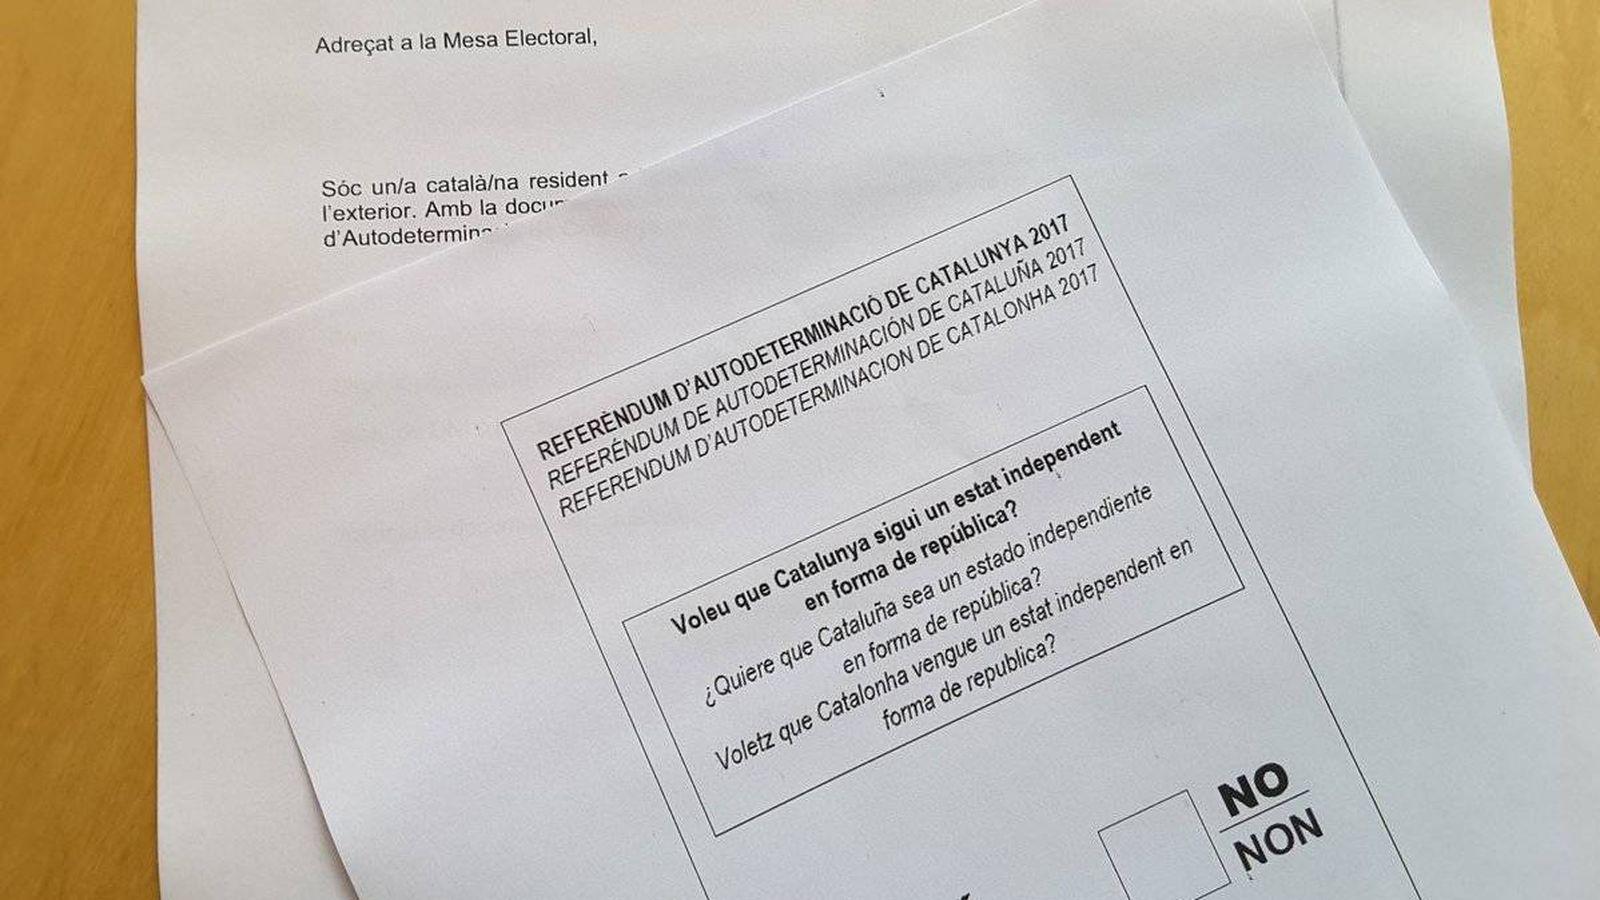 Foto: Papeleta del referéndum